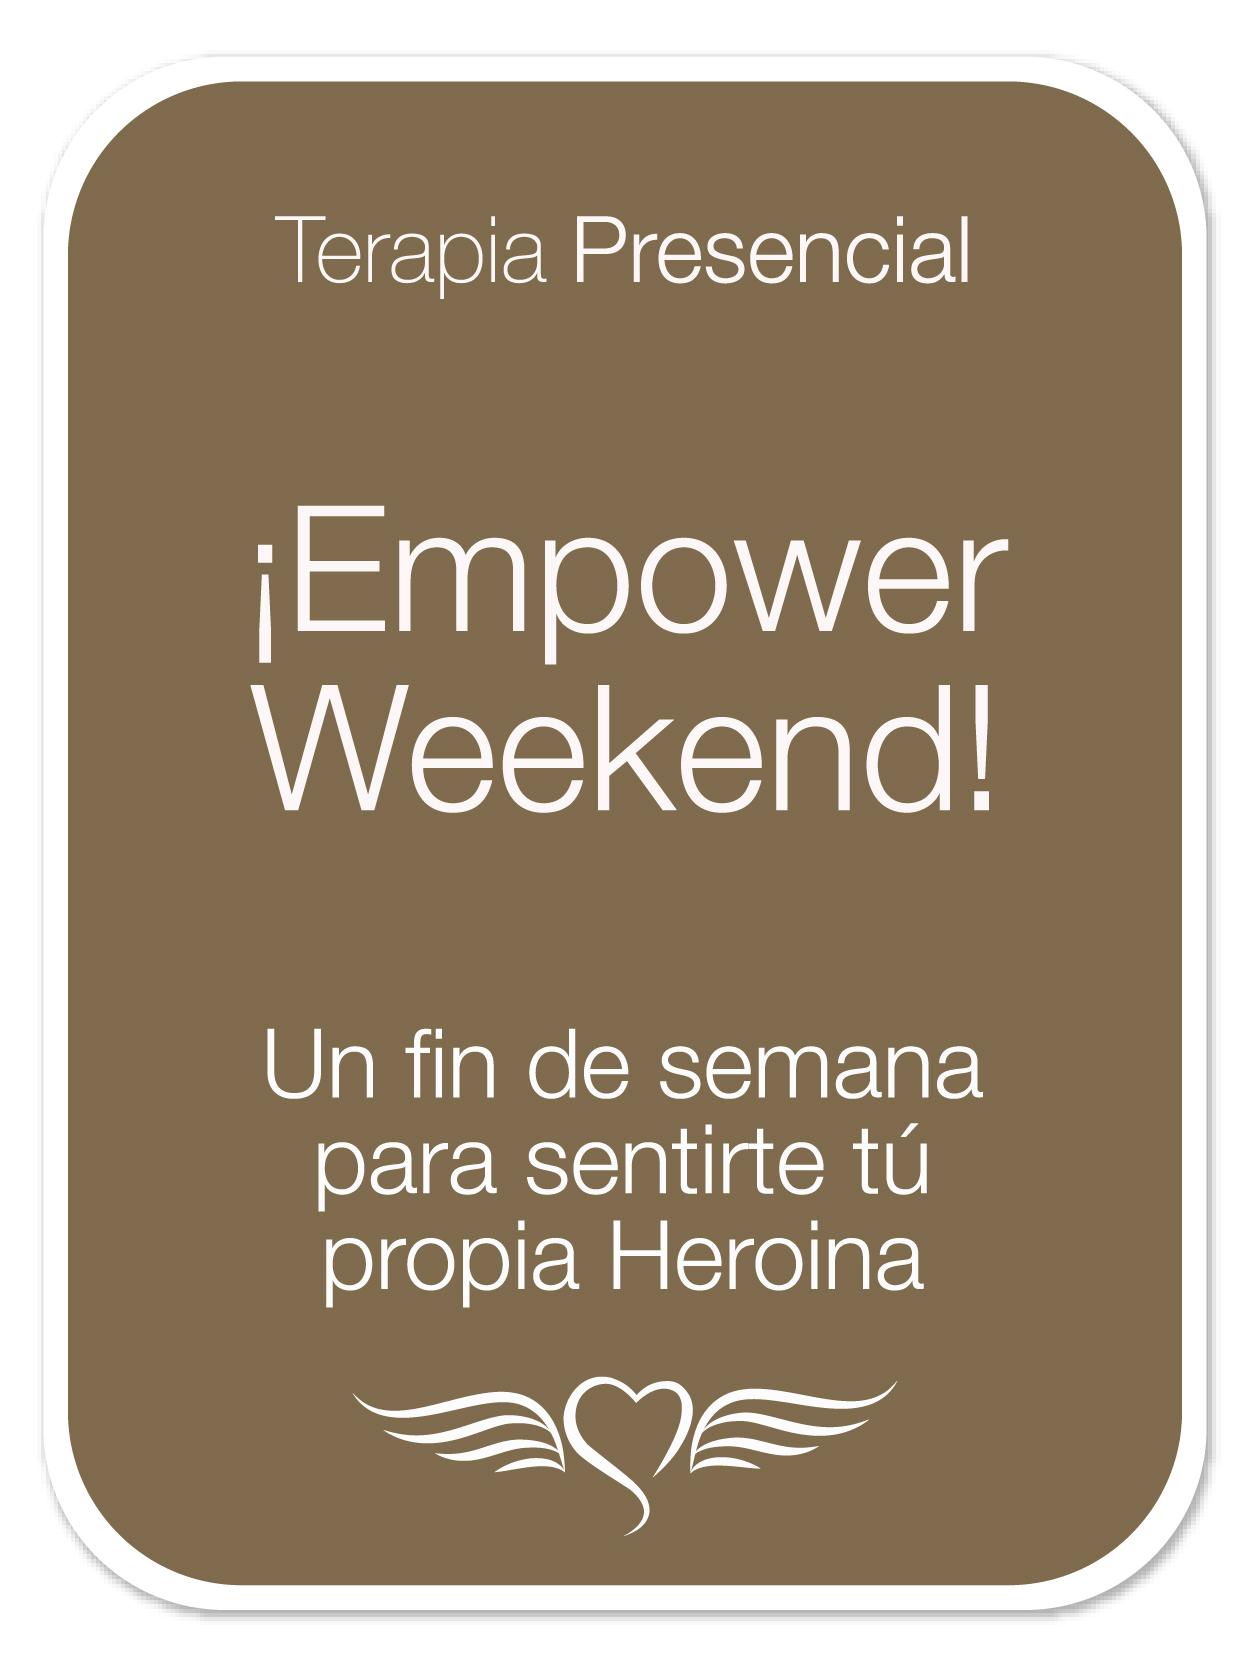 empower-weekend-elvira-muliterno-mujer-empoderamiento-empowermente-jefa-autoridad-poder-femenino-terapia